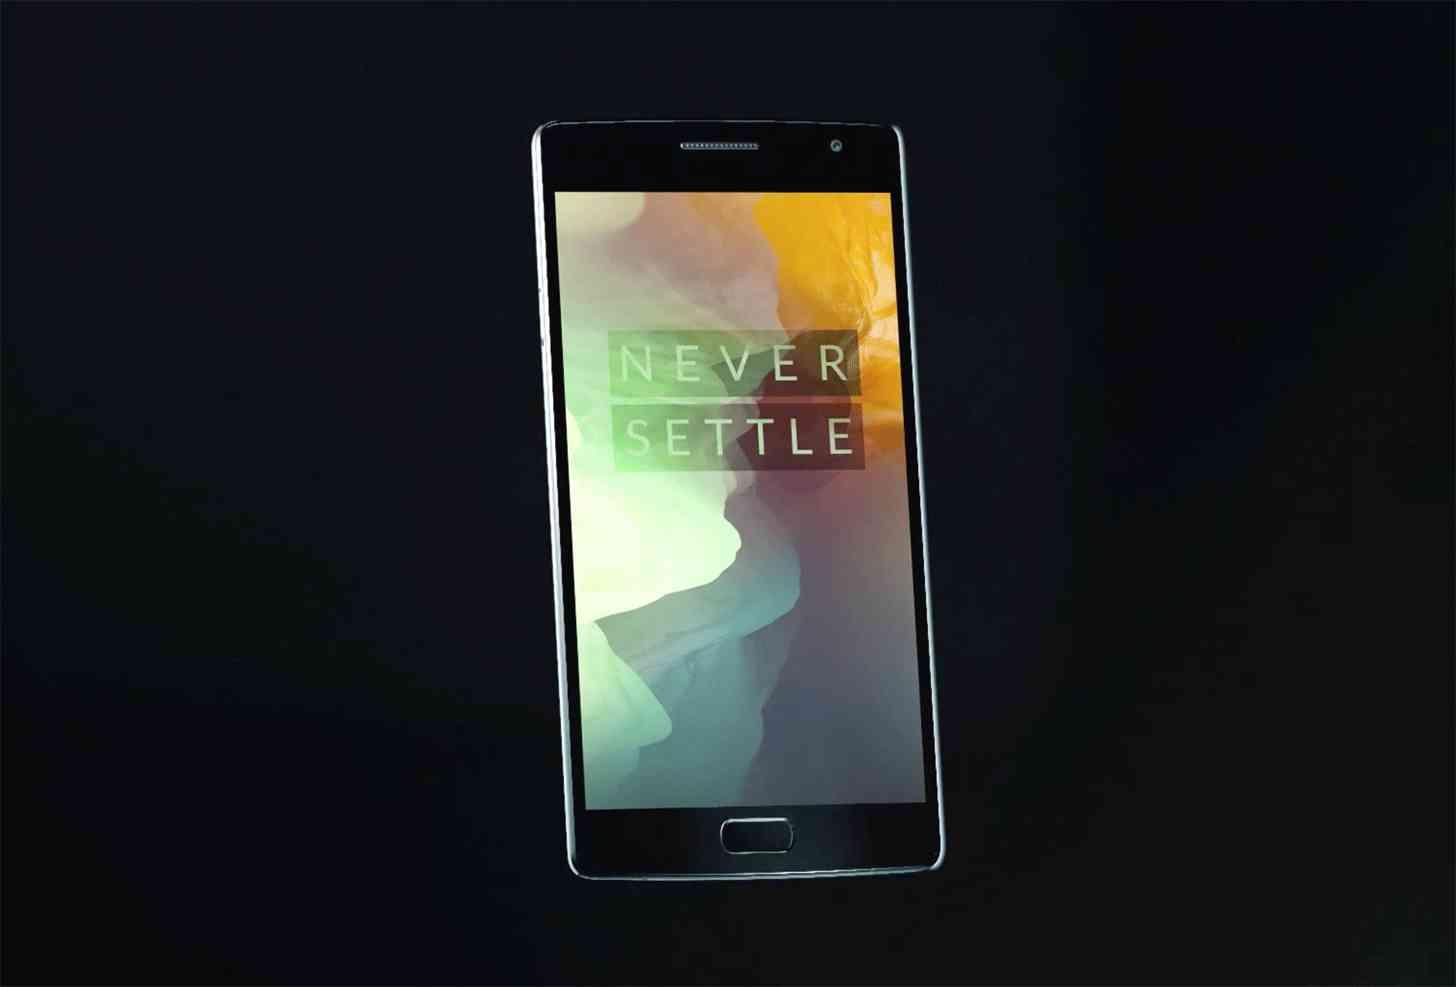 OnePlus OnePlus 2